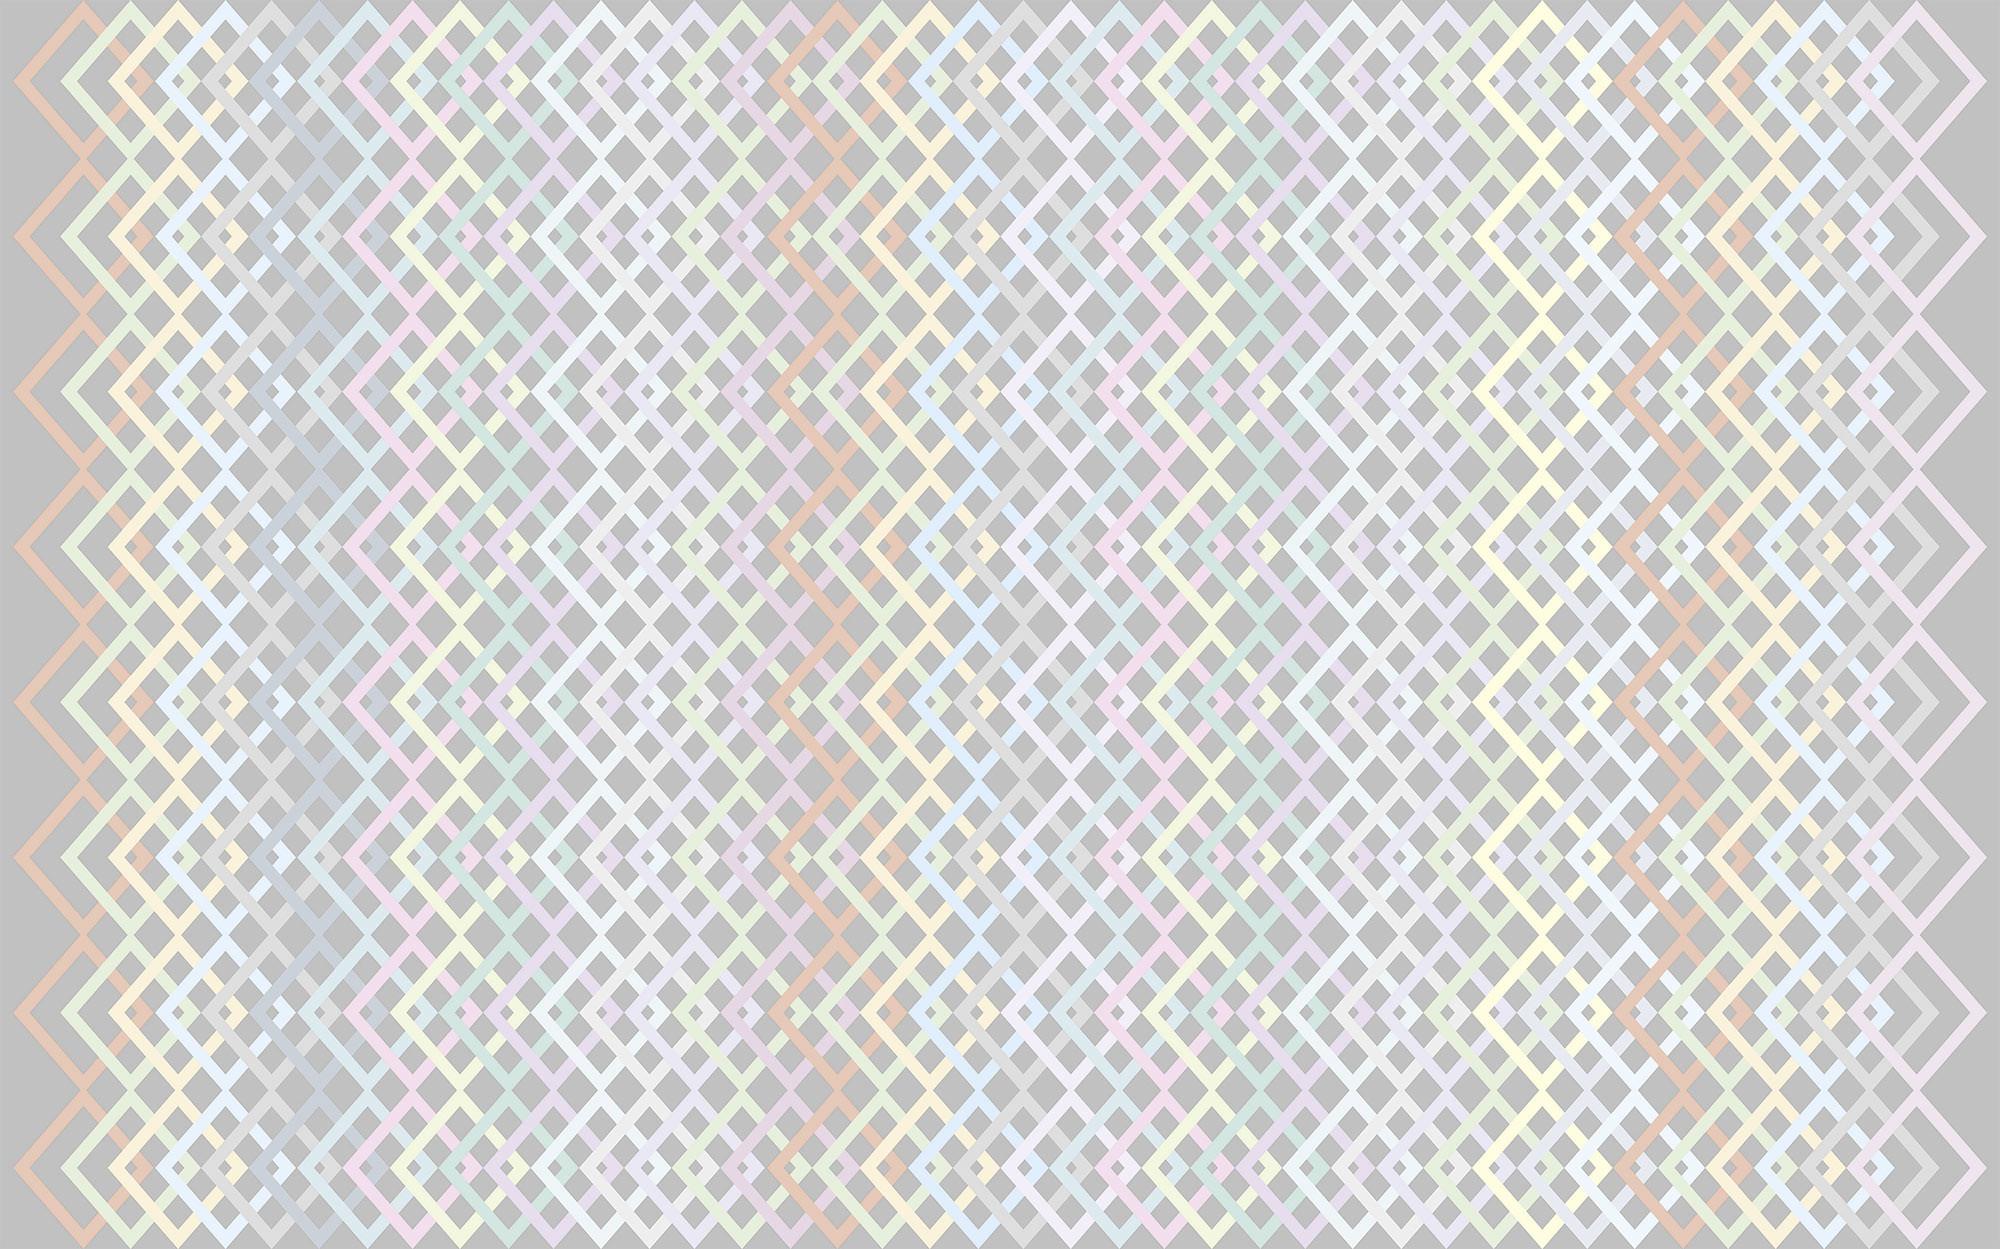 Structure Rhombus lightgrey-pastell